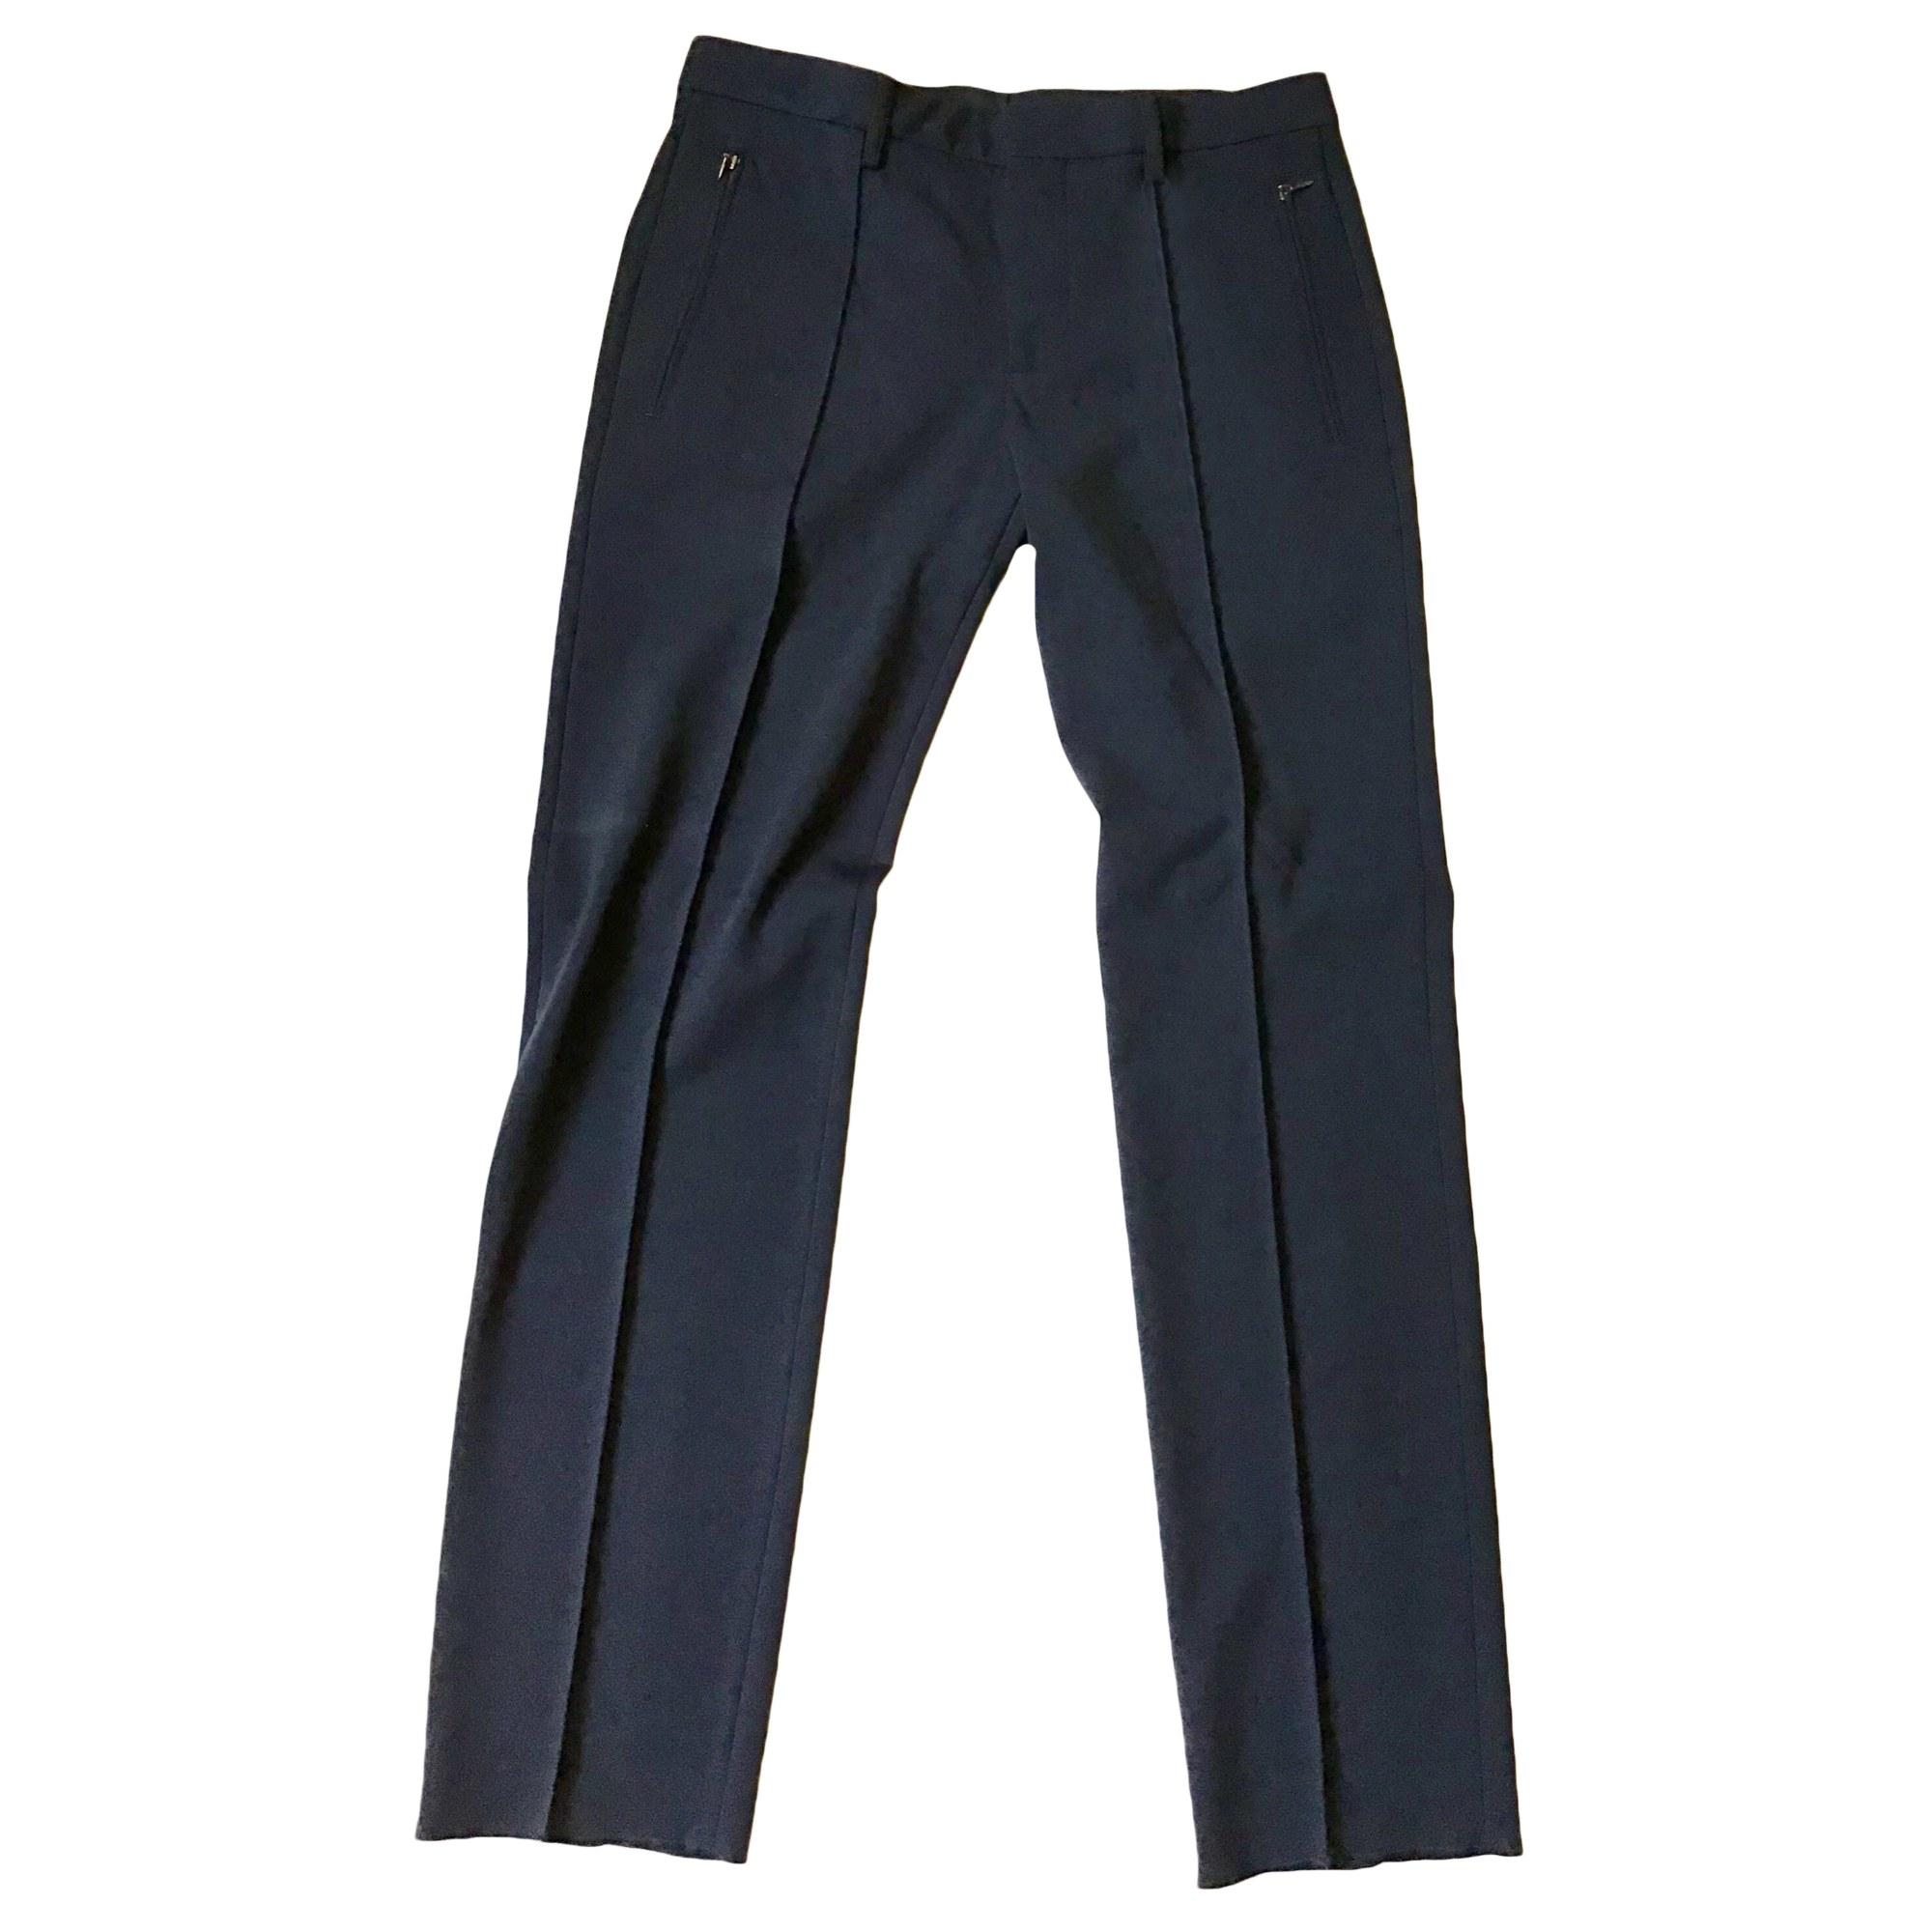 Pantalon droit DIRK BIKKEMBERGS Bleu, bleu marine, bleu turquoise